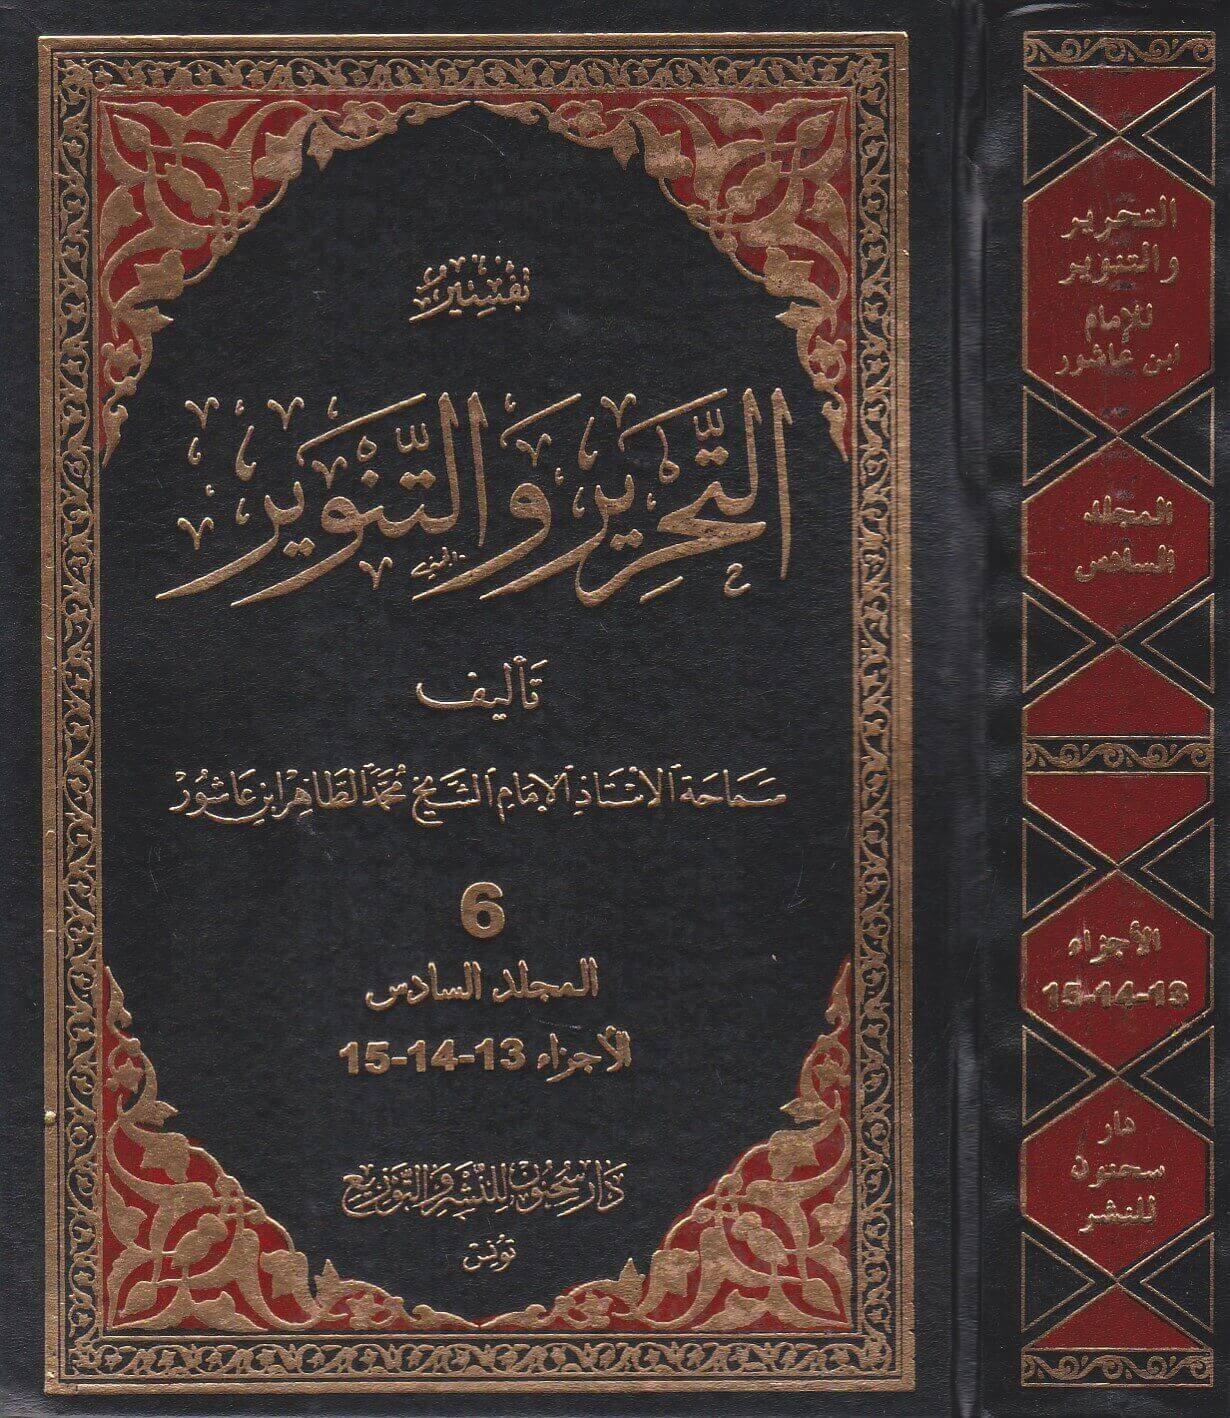 Photo of تحميل كتاب تفسير التحرير والتنوير pdf لـ محمد الطاهر بن عاشور